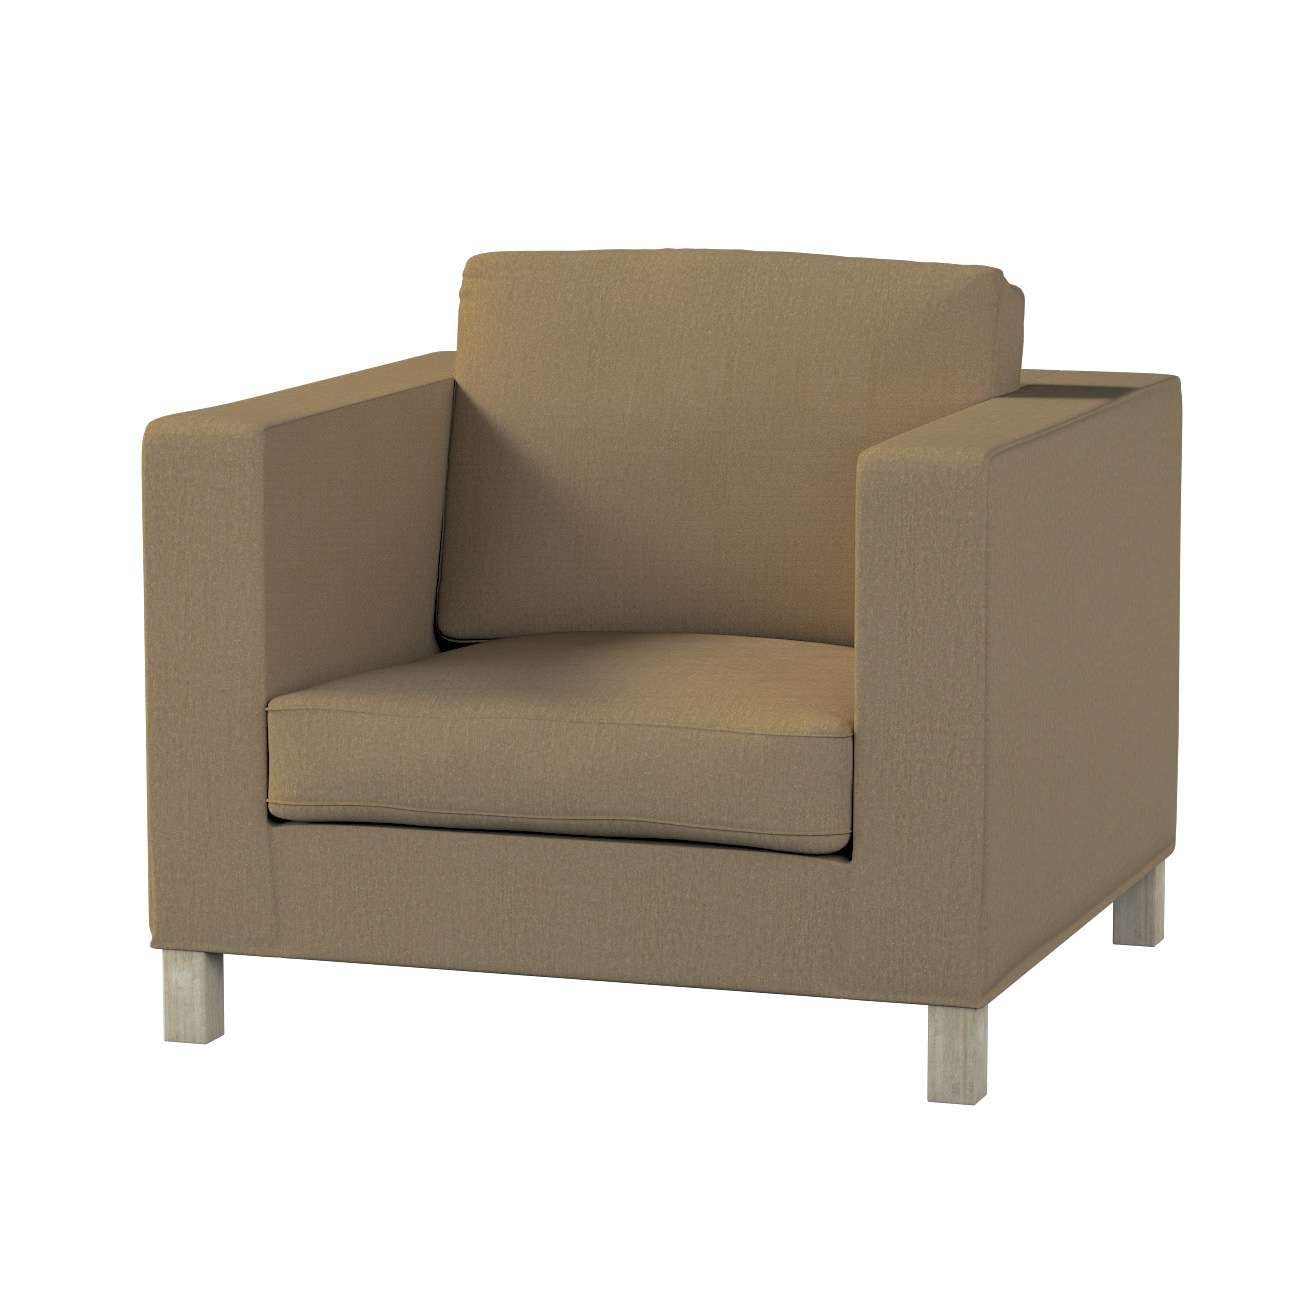 Pokrowiec na fotel Karlanda, krótki fotel Karlanda w kolekcji Chenille, tkanina: 702-21